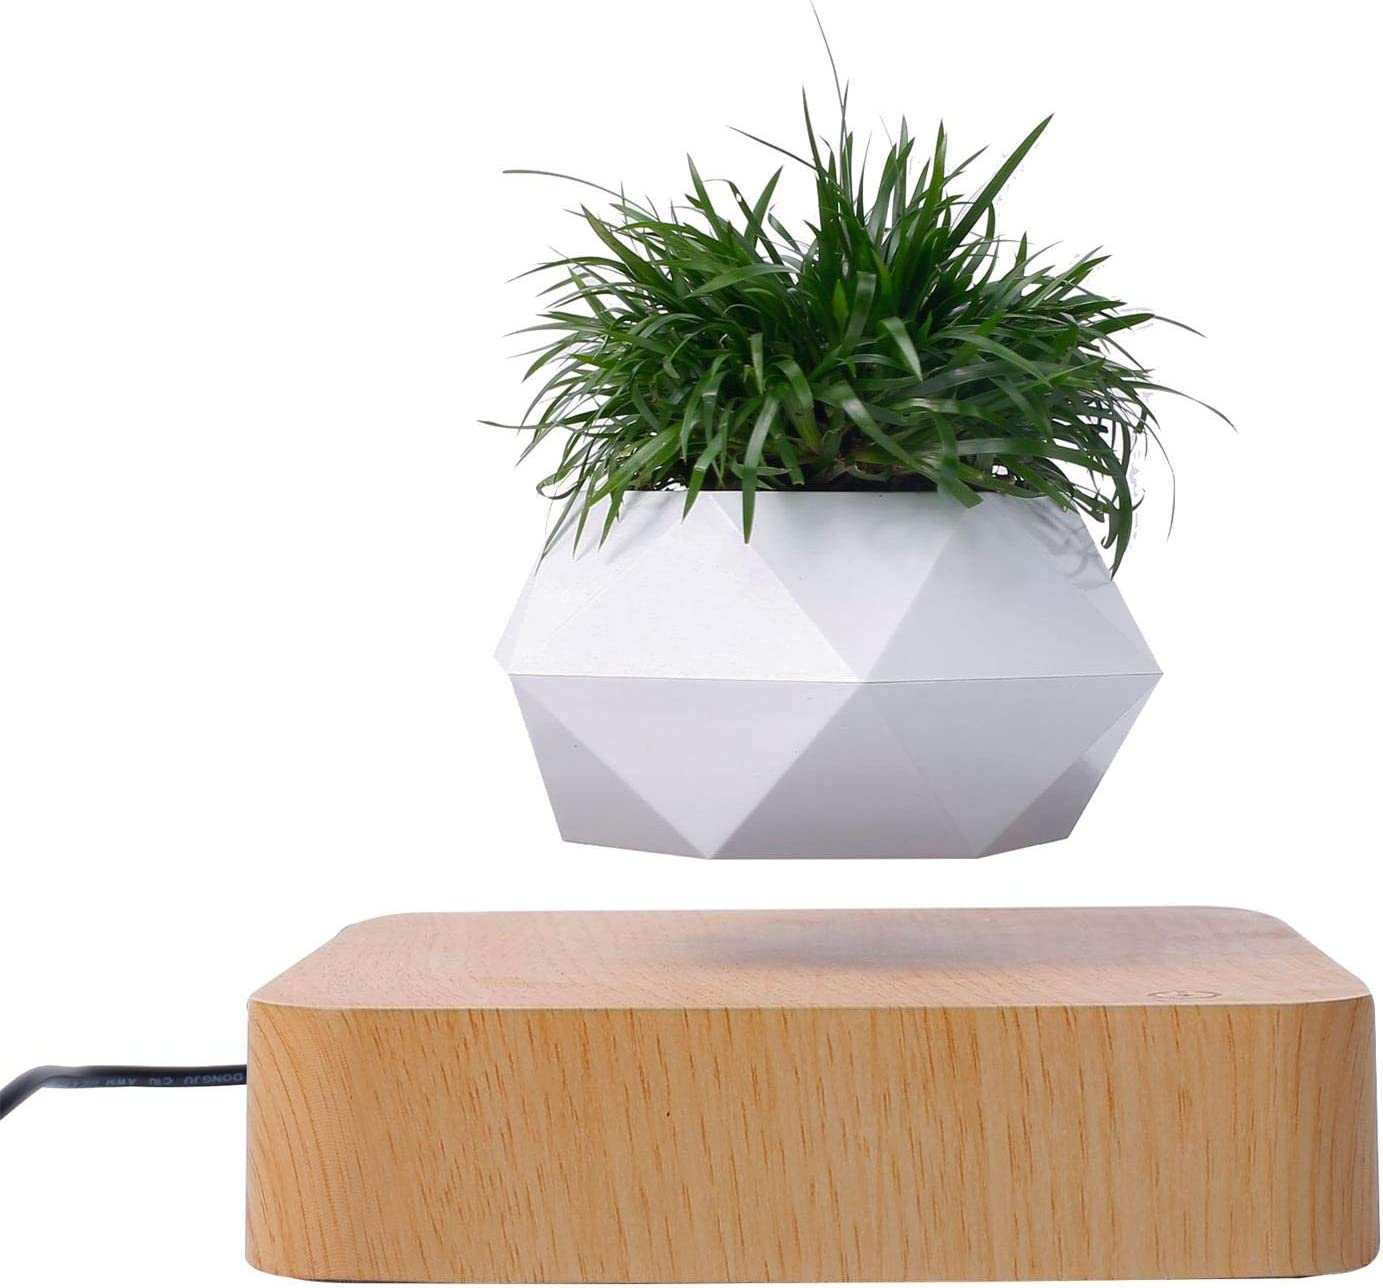 Levitating Plant Pot Display 格安 価格でご提供いたします Bonsai Air Magnetic 現金特価